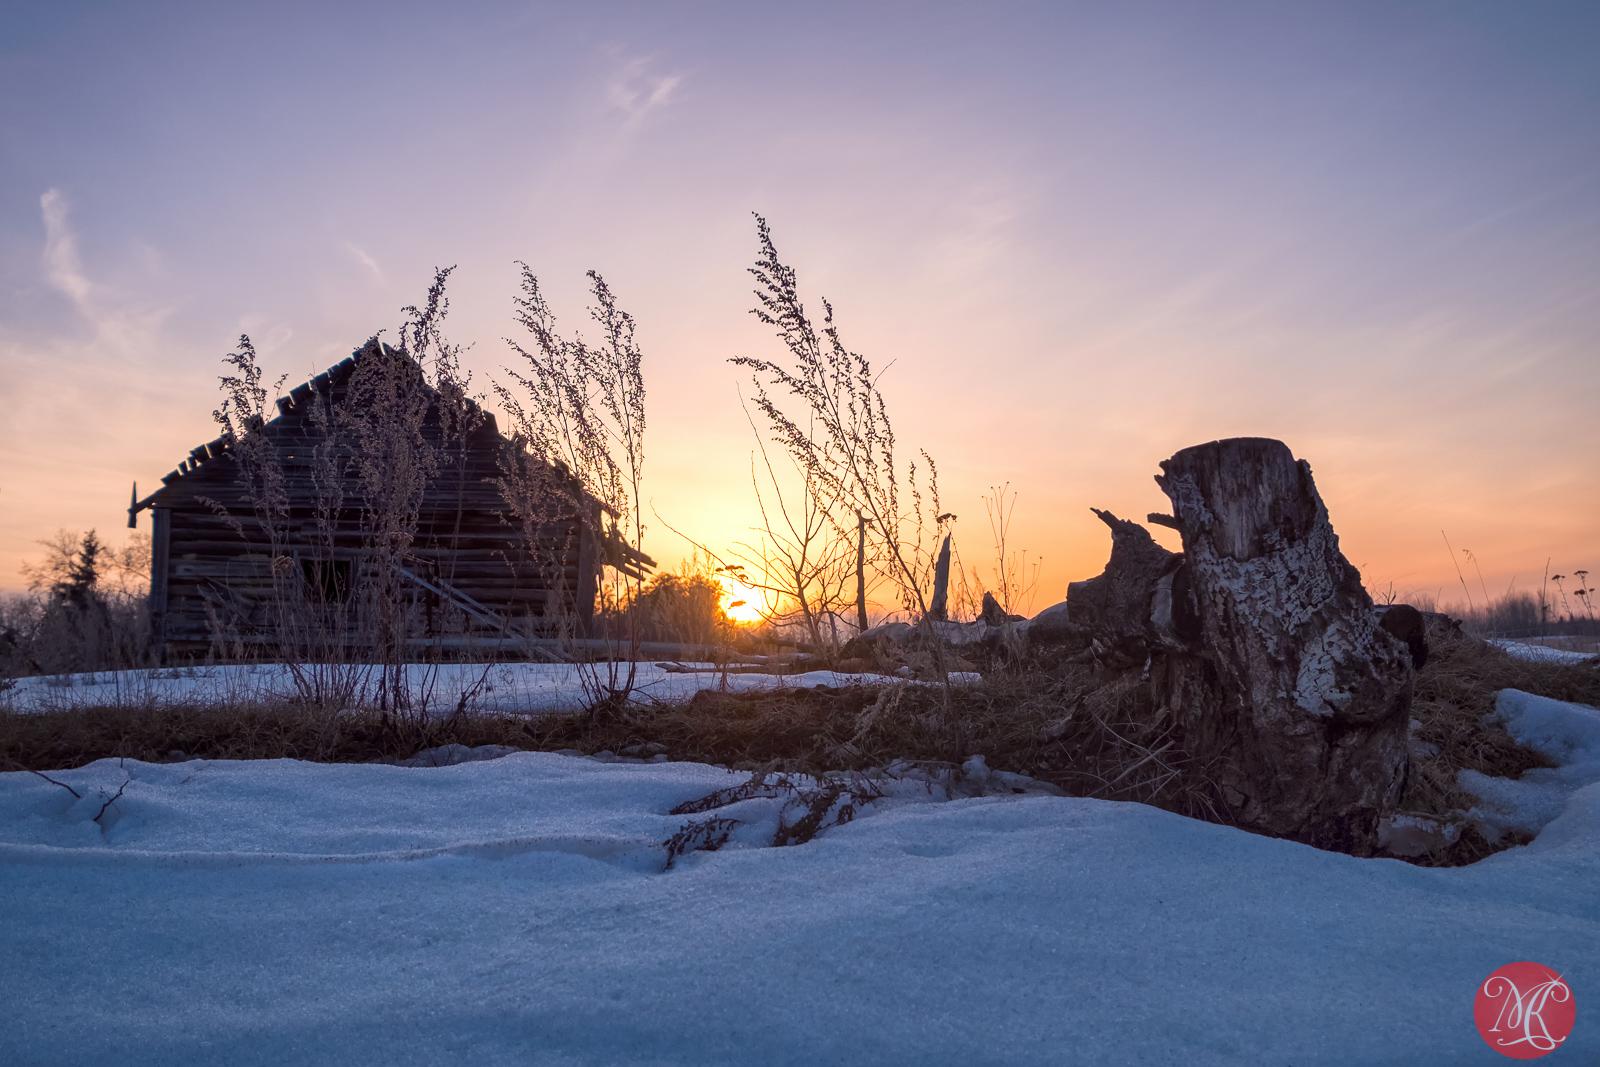 Sun is setting on the prairies